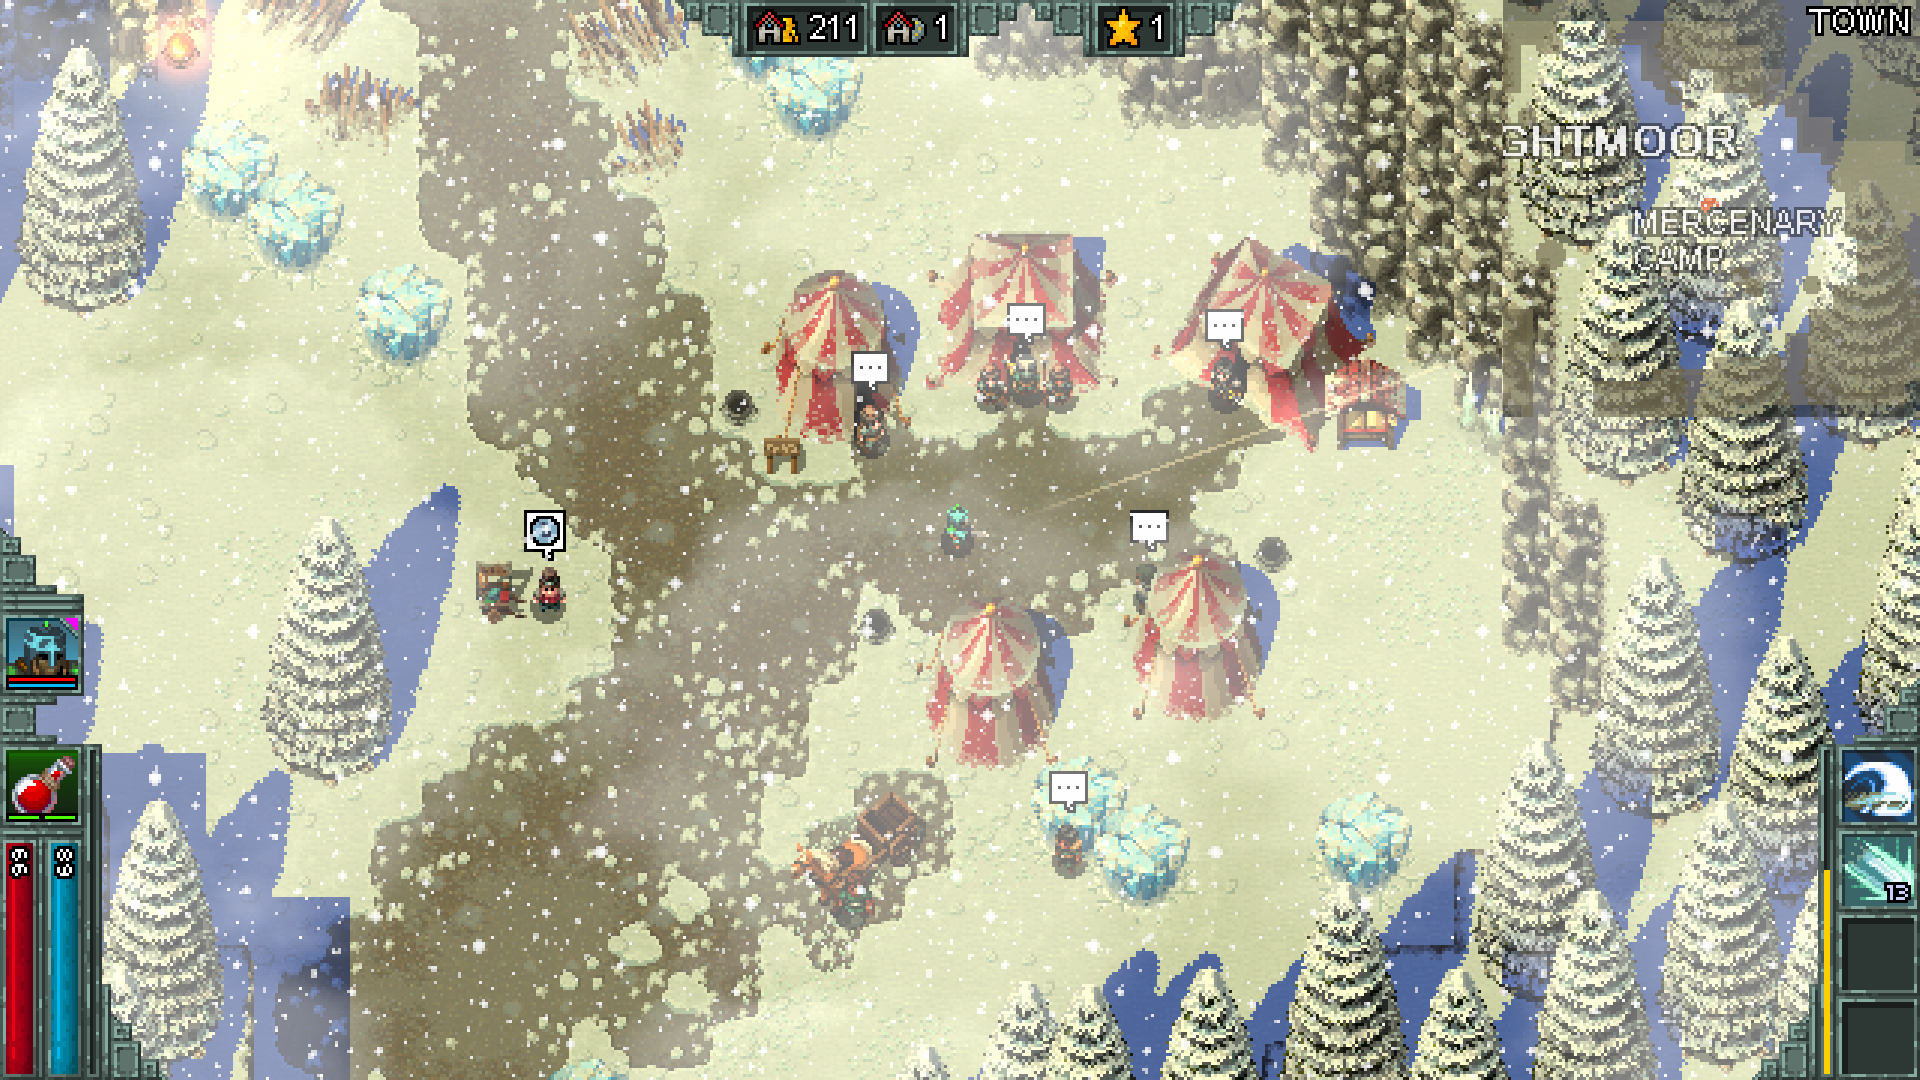 Heroes of Hammerwatch game screenshot, snowy landscape